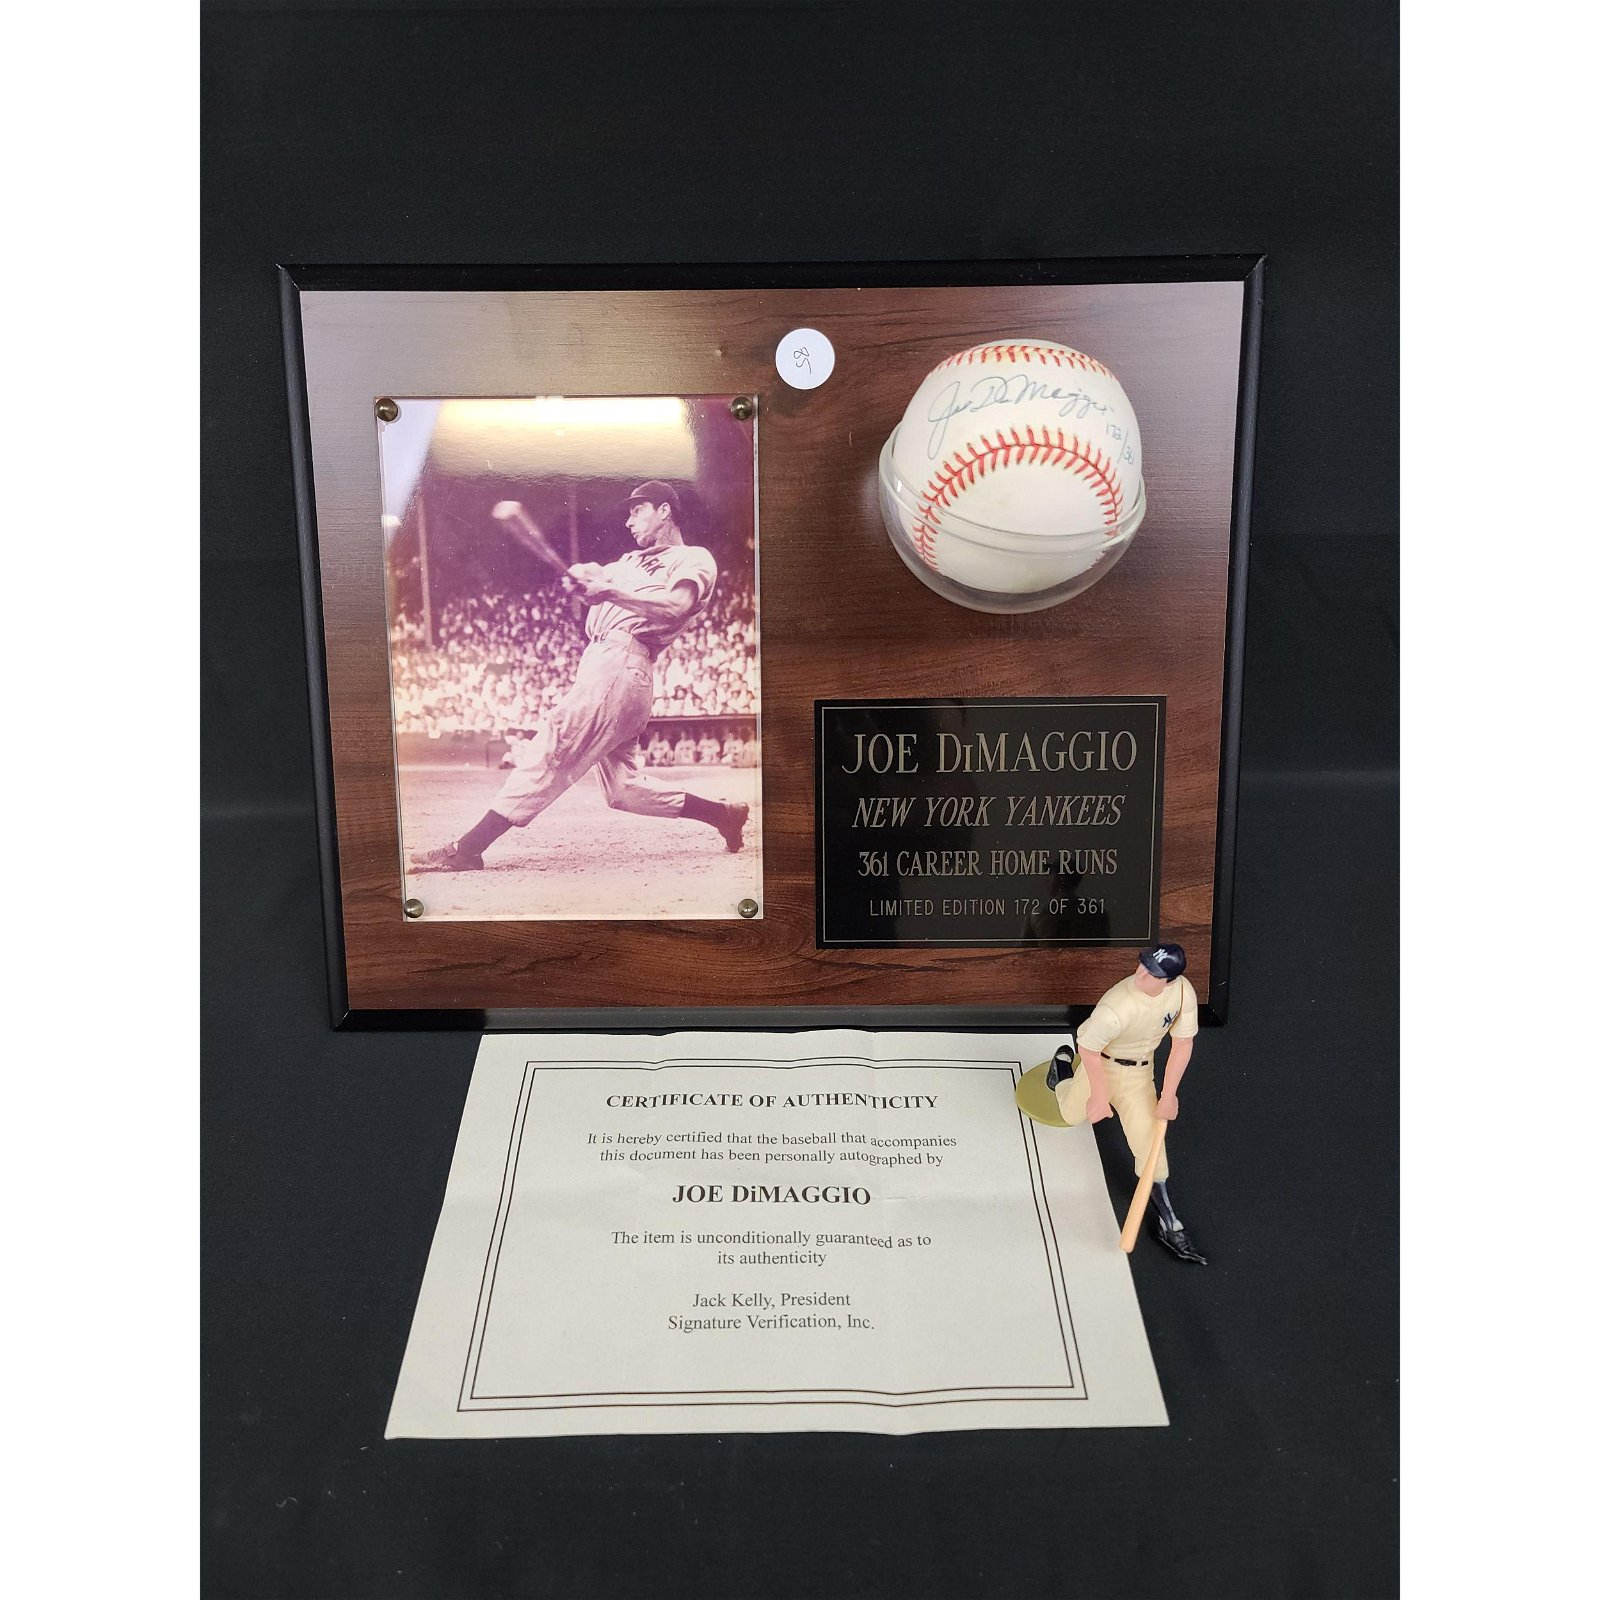 LIMITED EDITION Autographed JOE DIMAGGIO Baseball w/ Pl